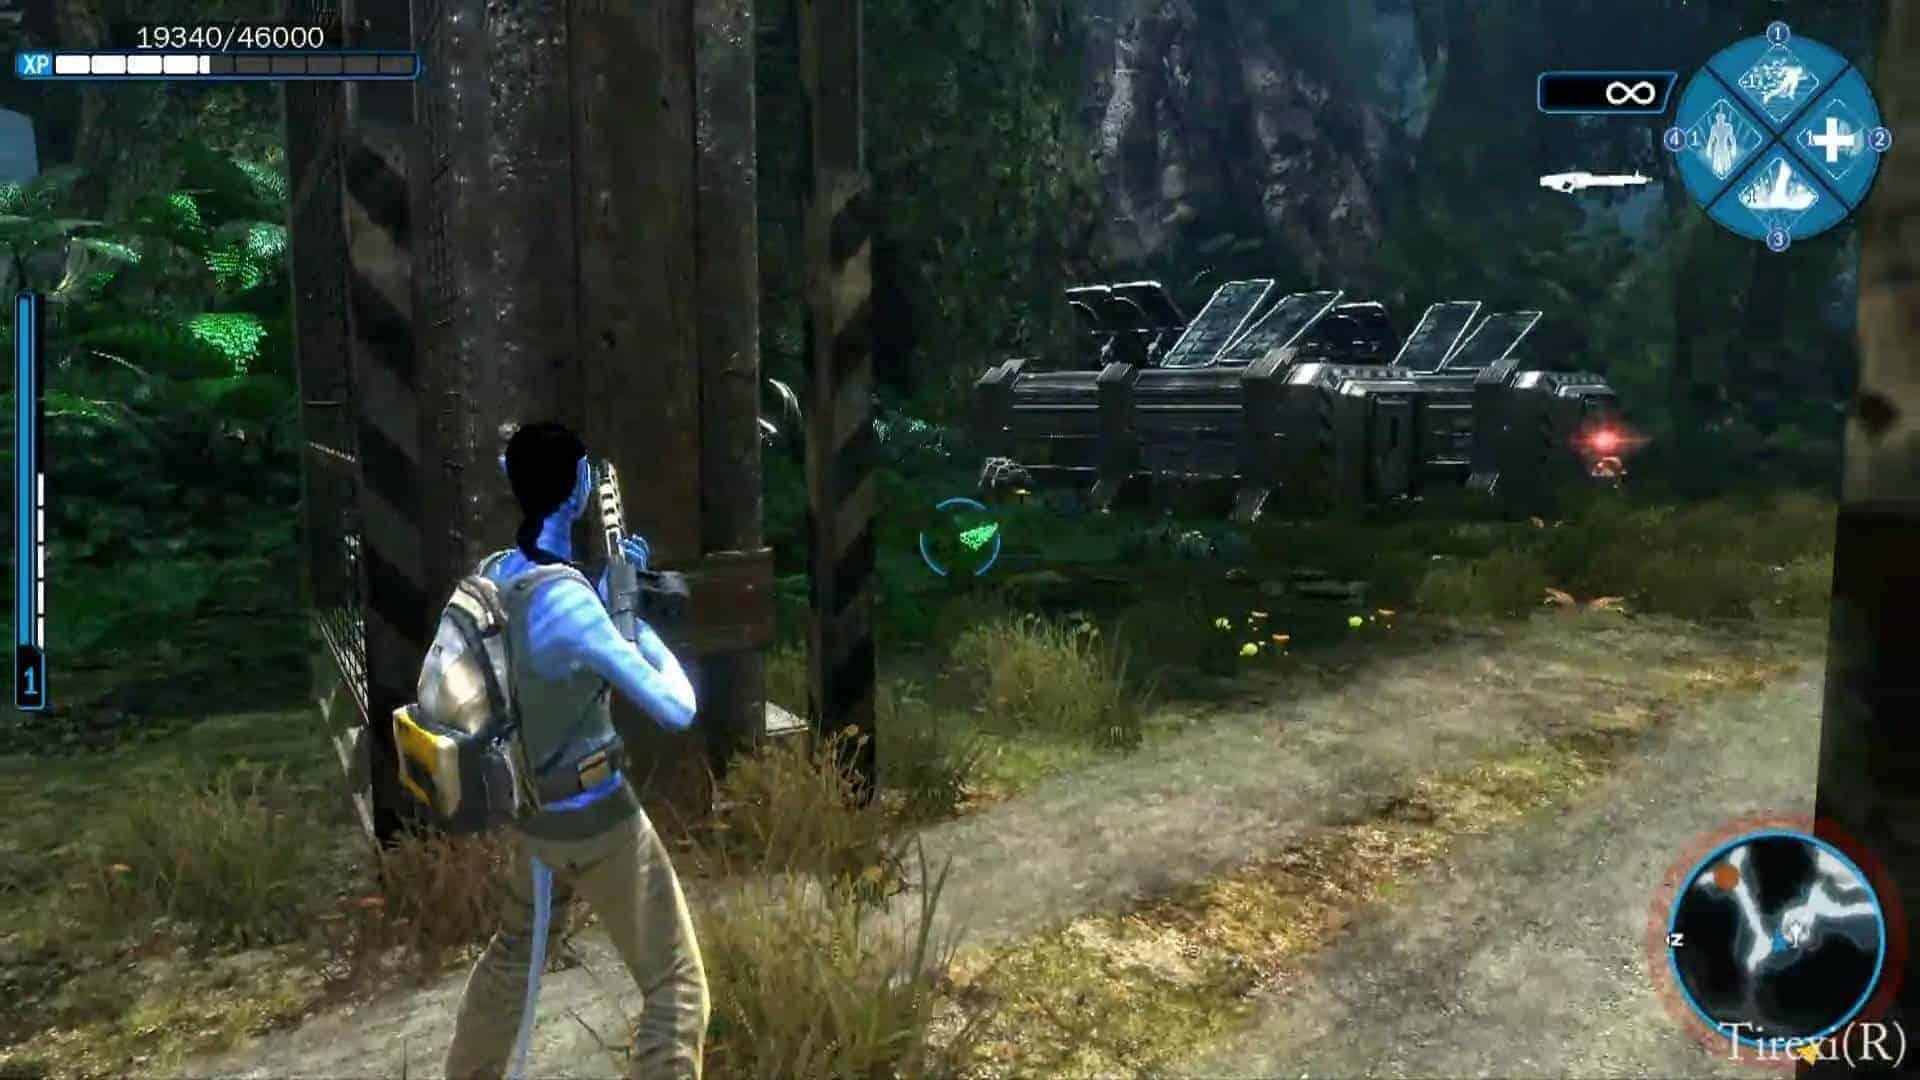 Скачять активированый avatar the game